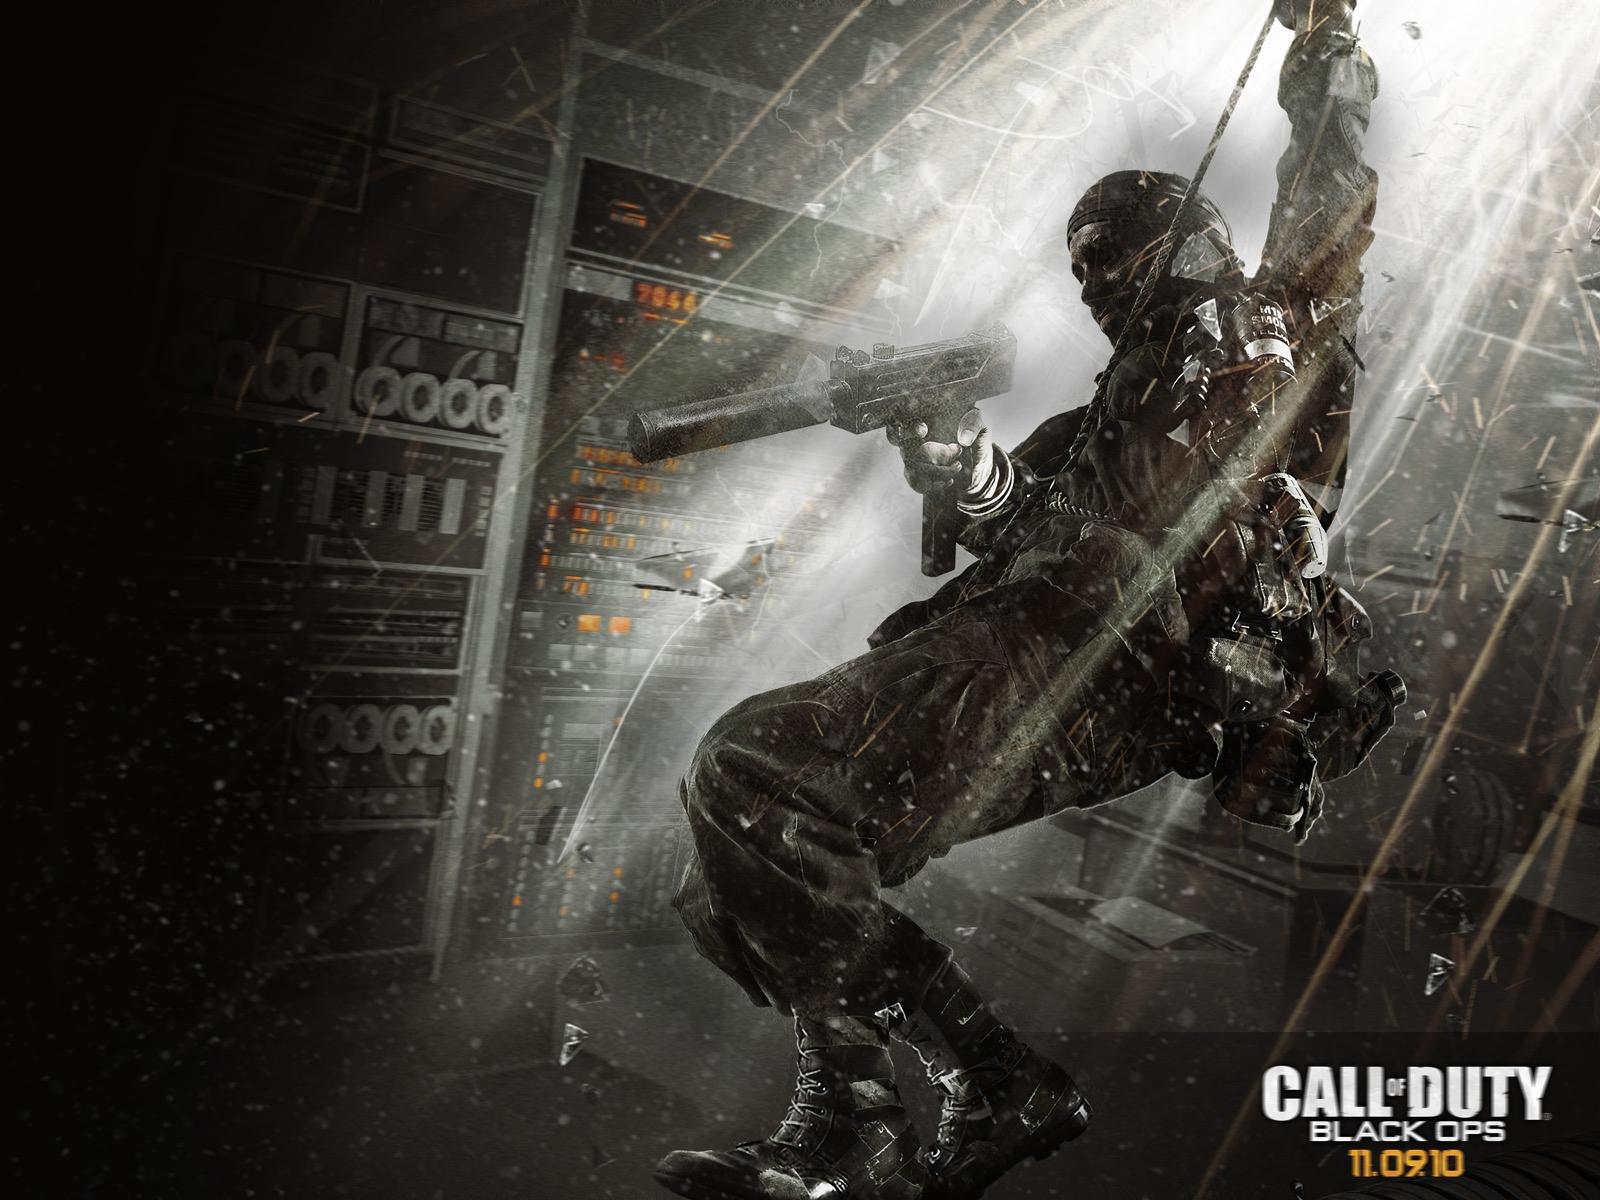 Call of Duty   Black OPS HD Wallpaper 1080p   HD Dock 1600x1200